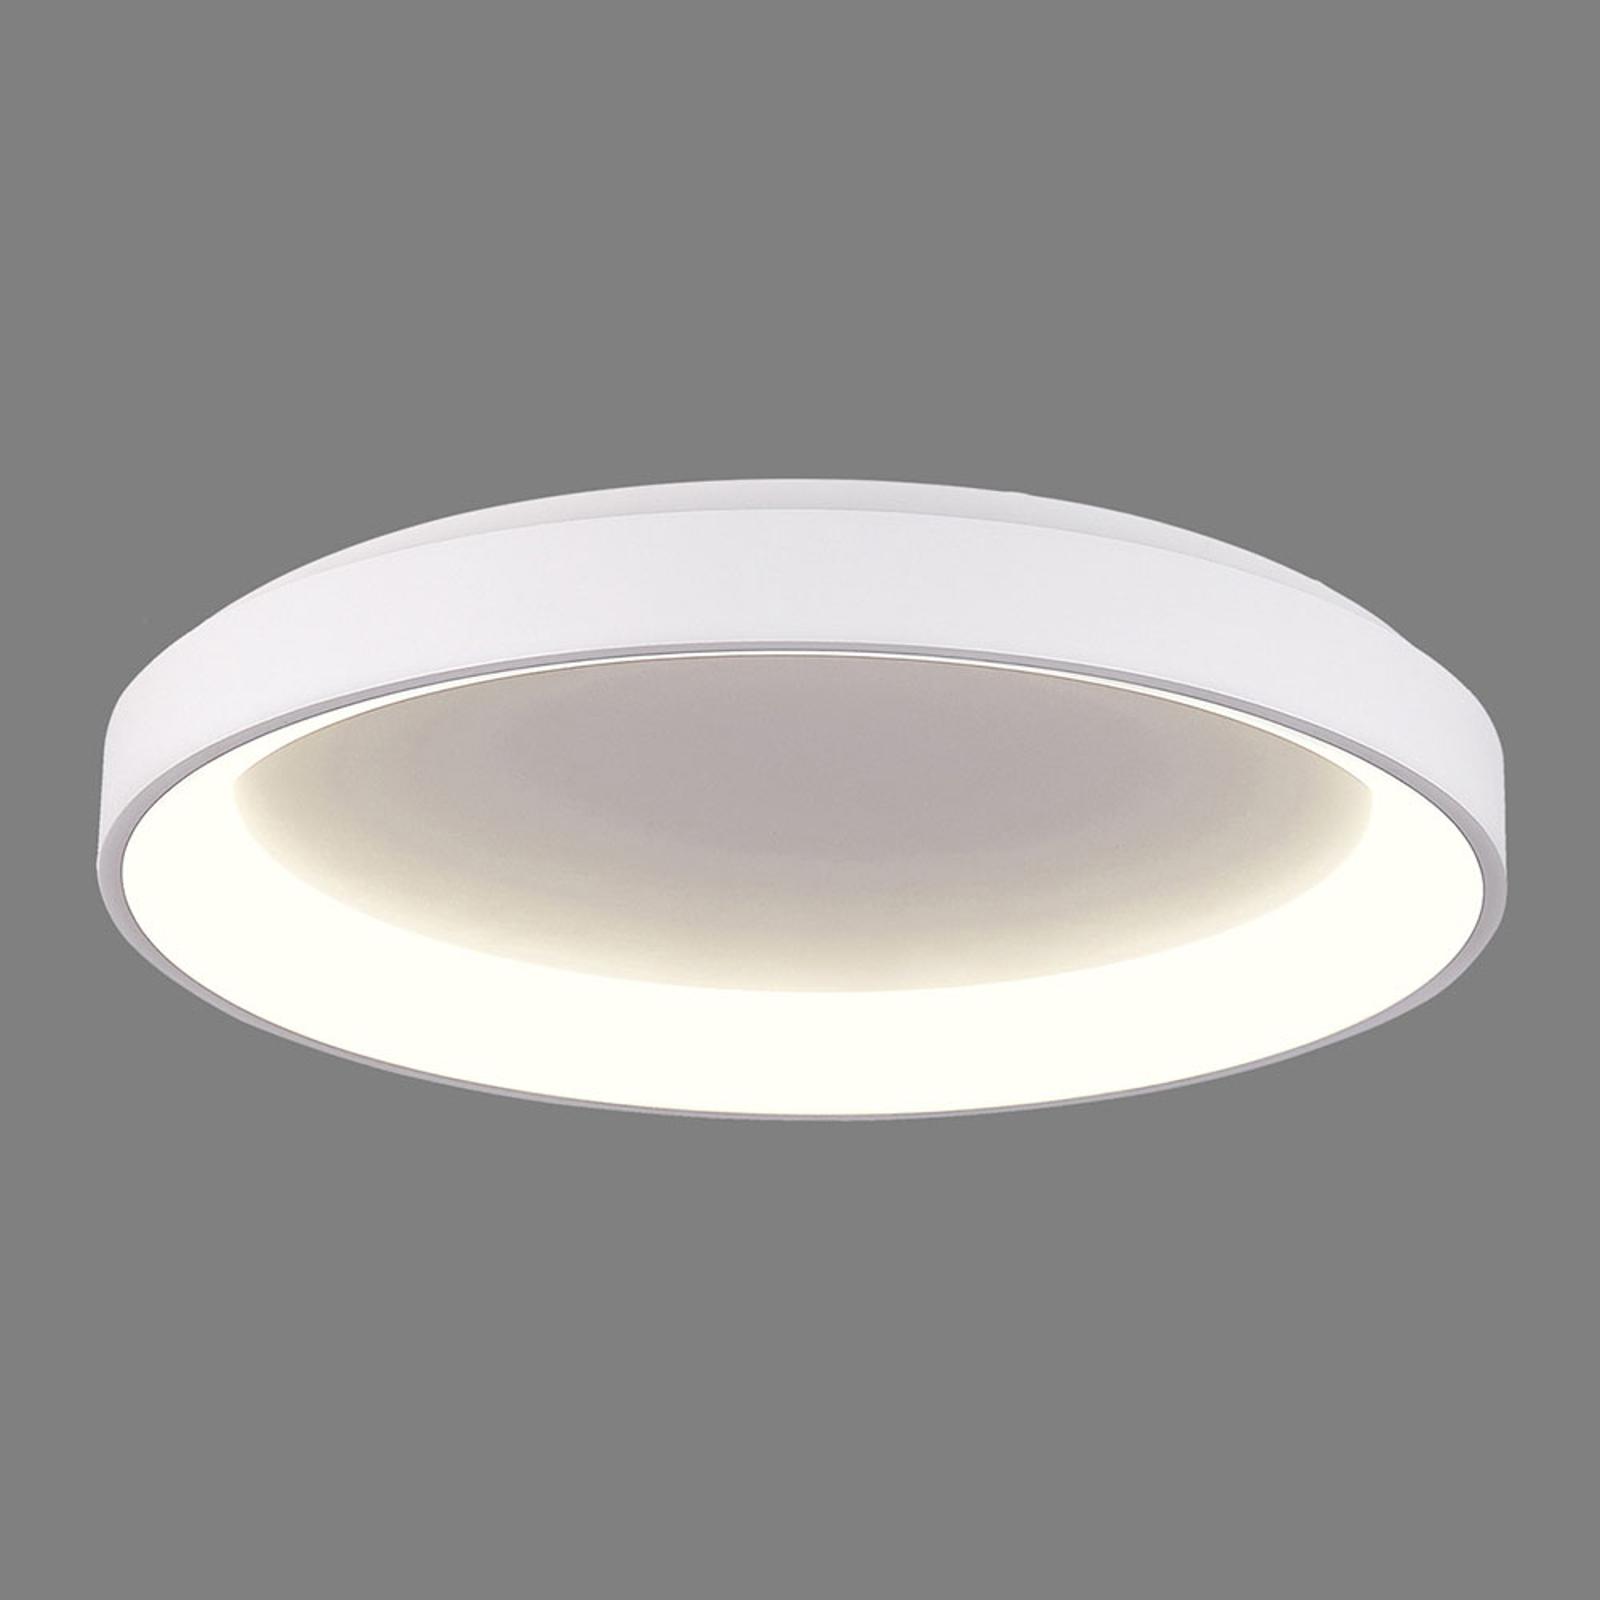 LED-Deckenleuchte Grace, DALI, Ø 58 cm, Casambi